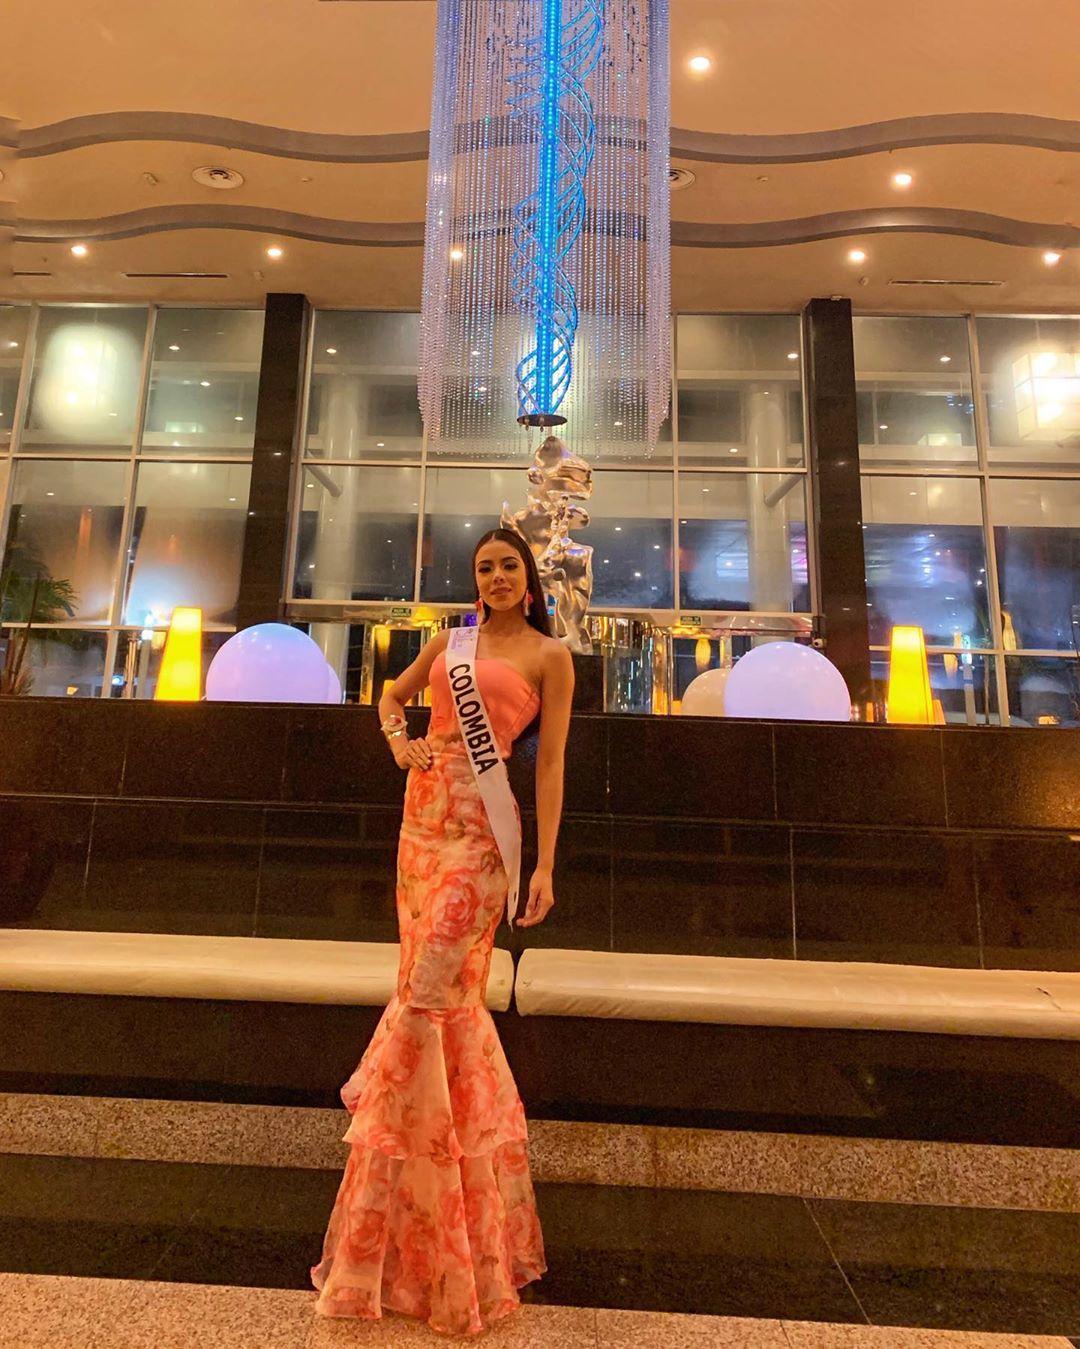 gina aguirre, virreyna de miss latinoamerica 2019. - Página 4 70705210